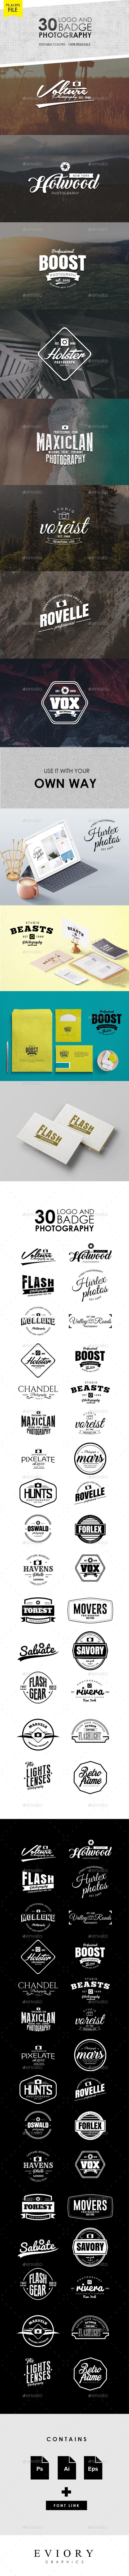 30 Photography Logo & Badge - Badges & Stickers Web Elements